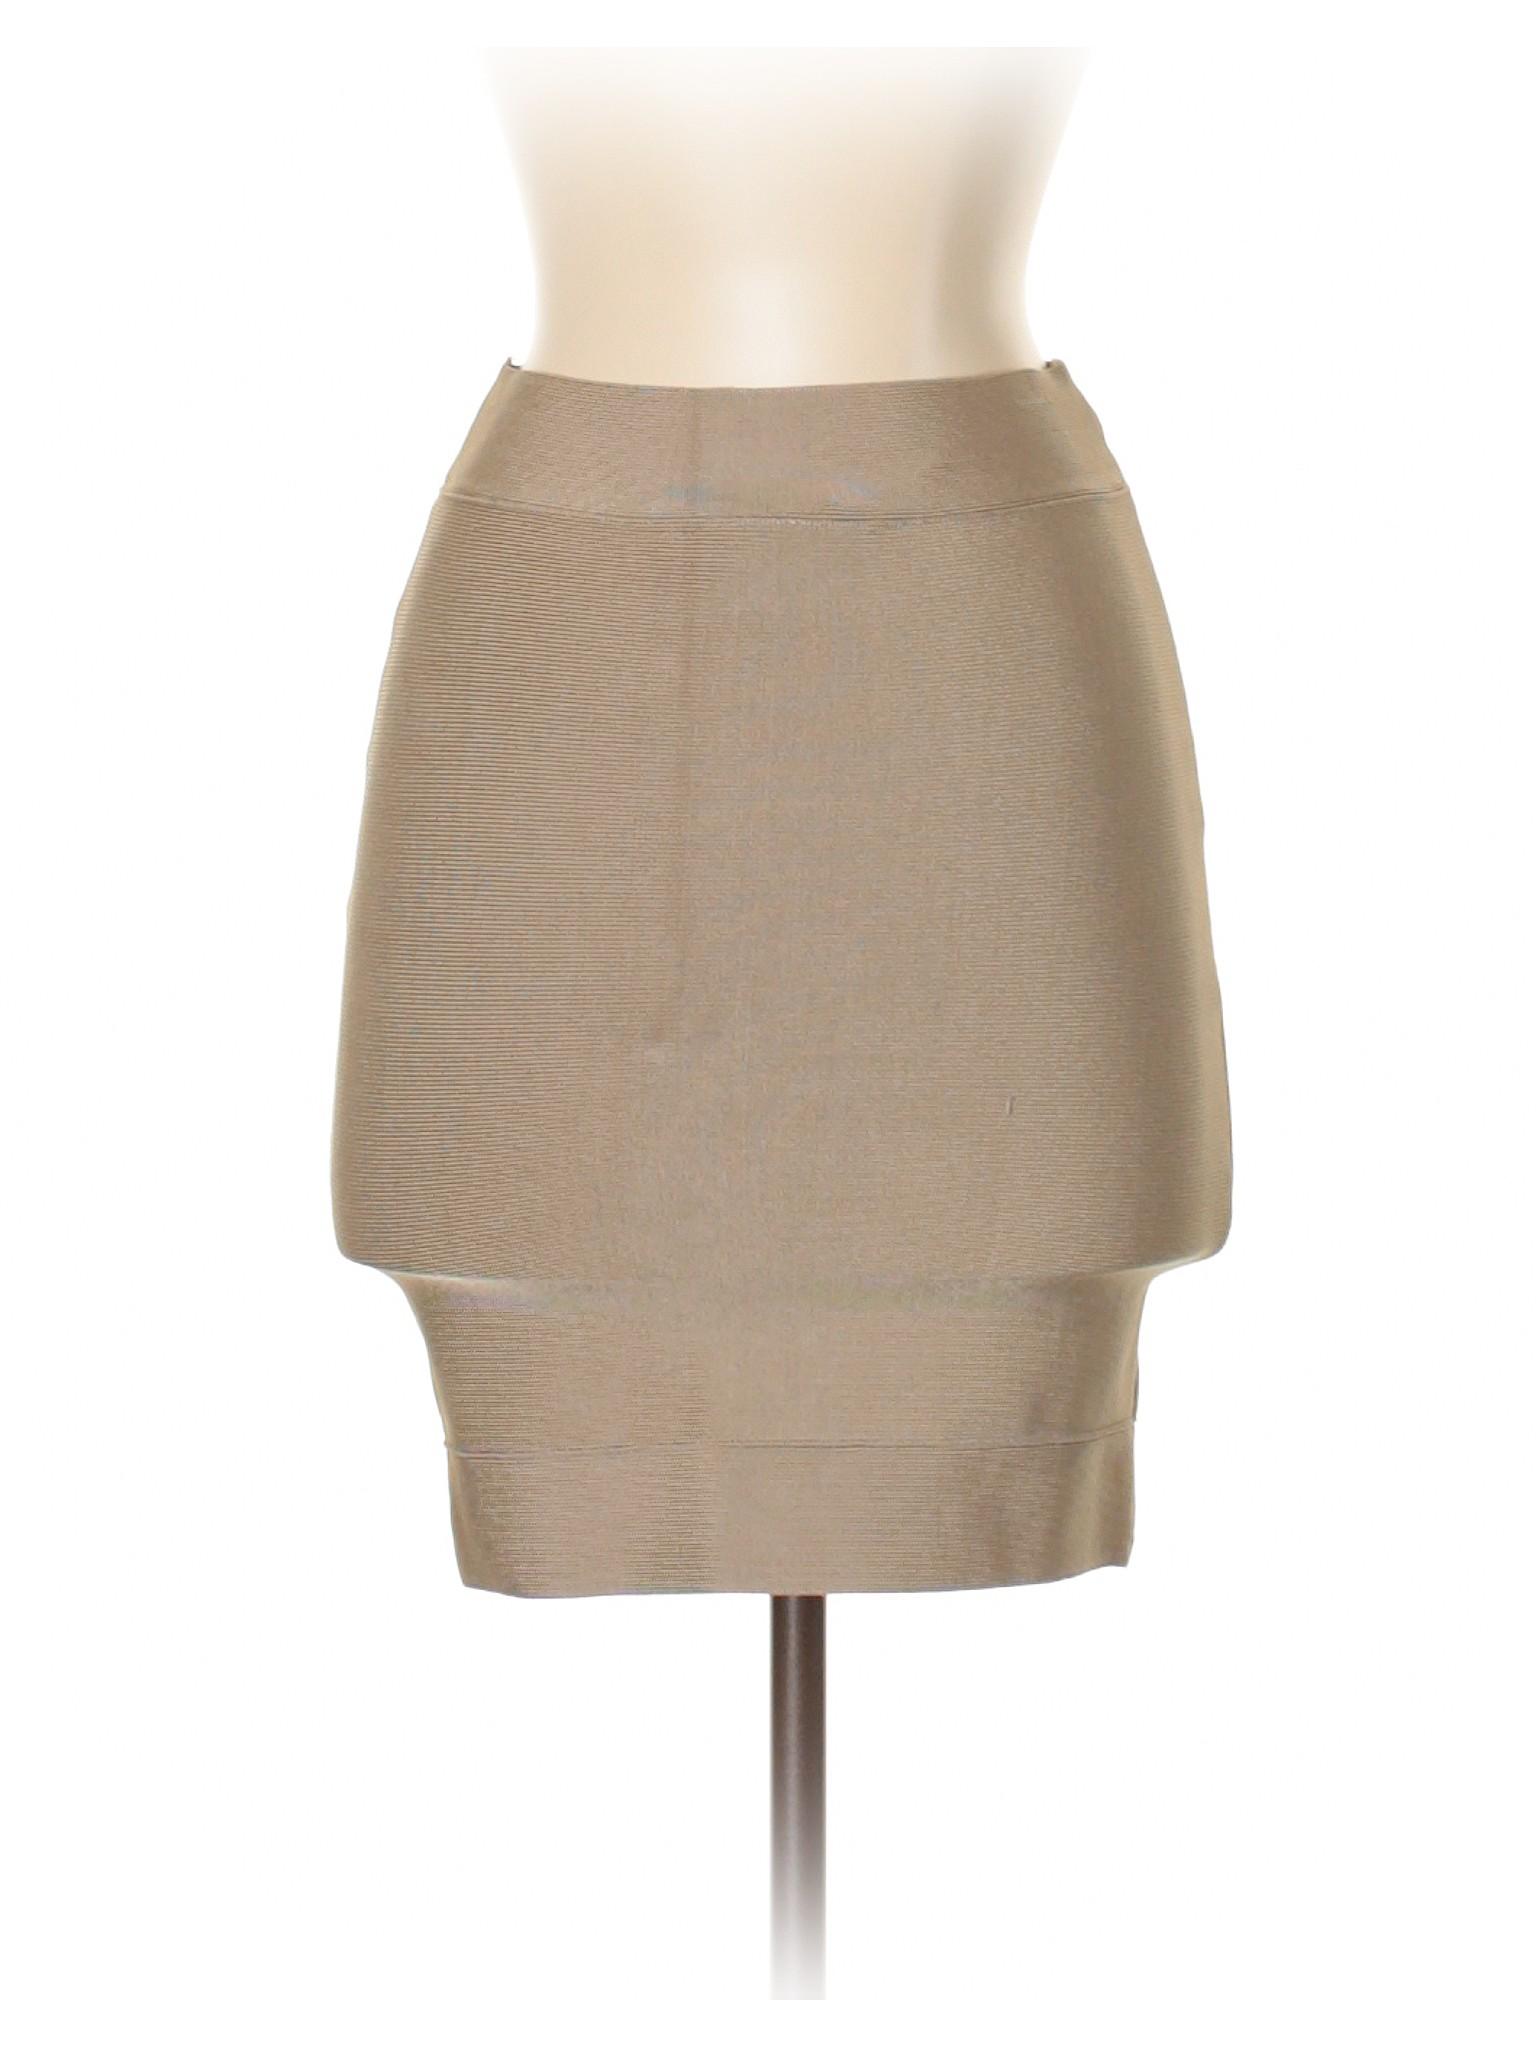 Skirt Boutique Skirt Boutique Skirt Casual Casual Casual Casual Boutique Boutique xPtz0PqYw